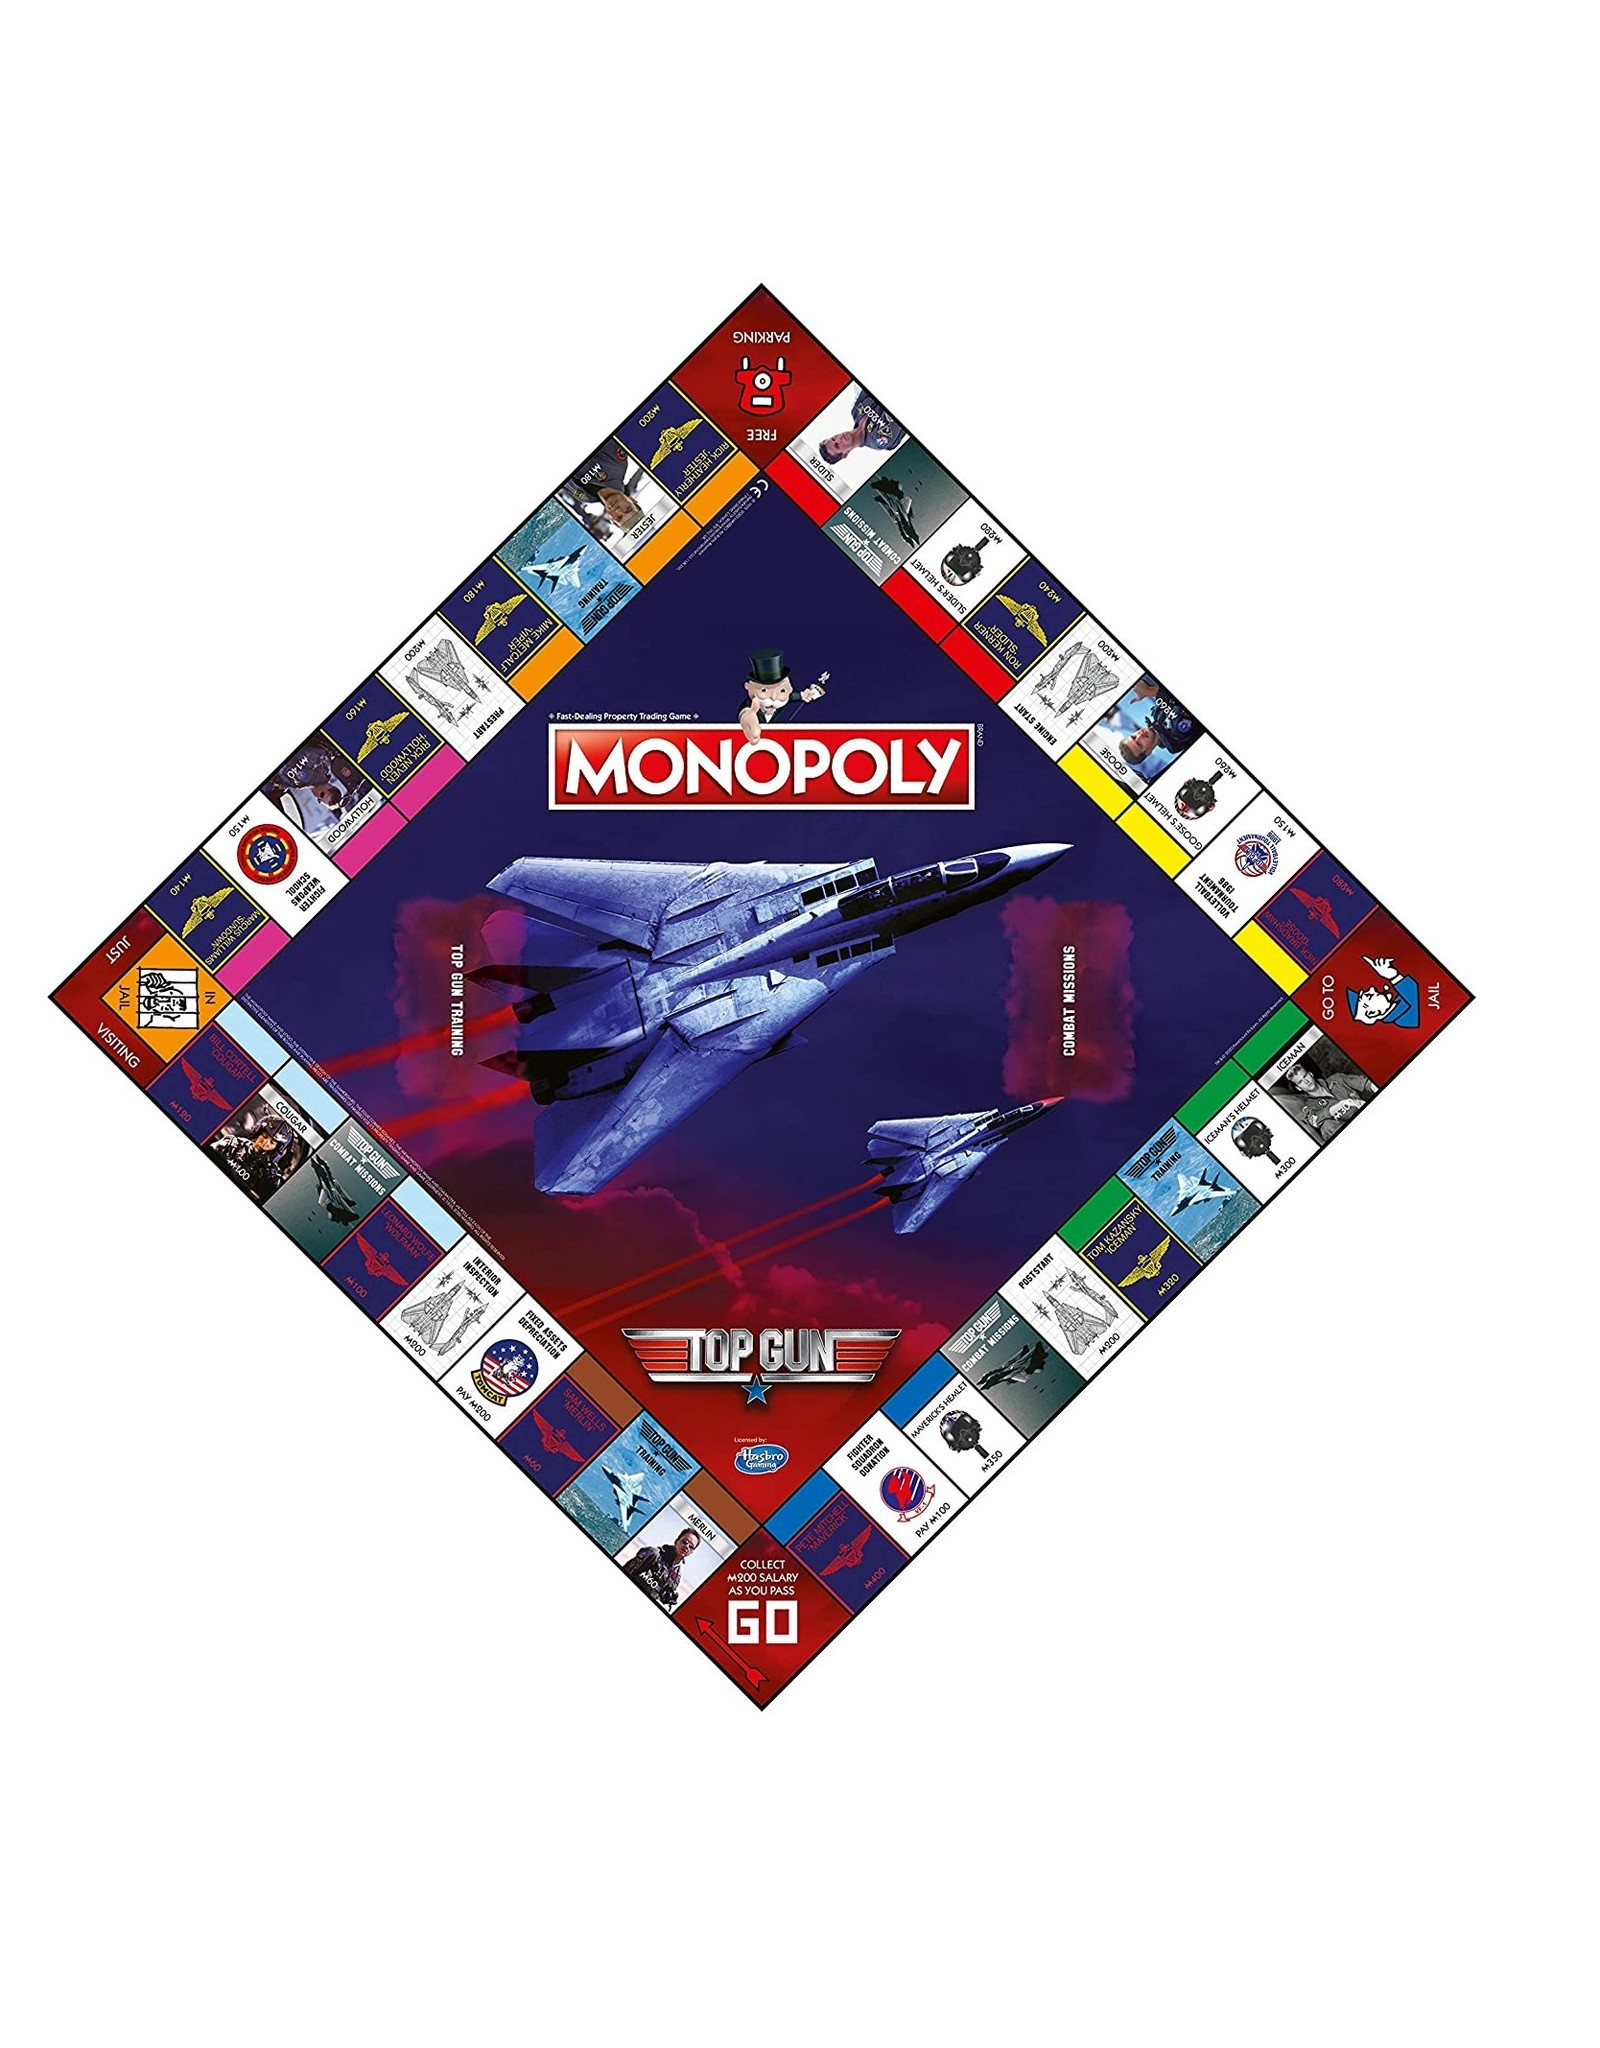 Monopoly Top Gun - Monopoly - Bordspel - Engelstalig